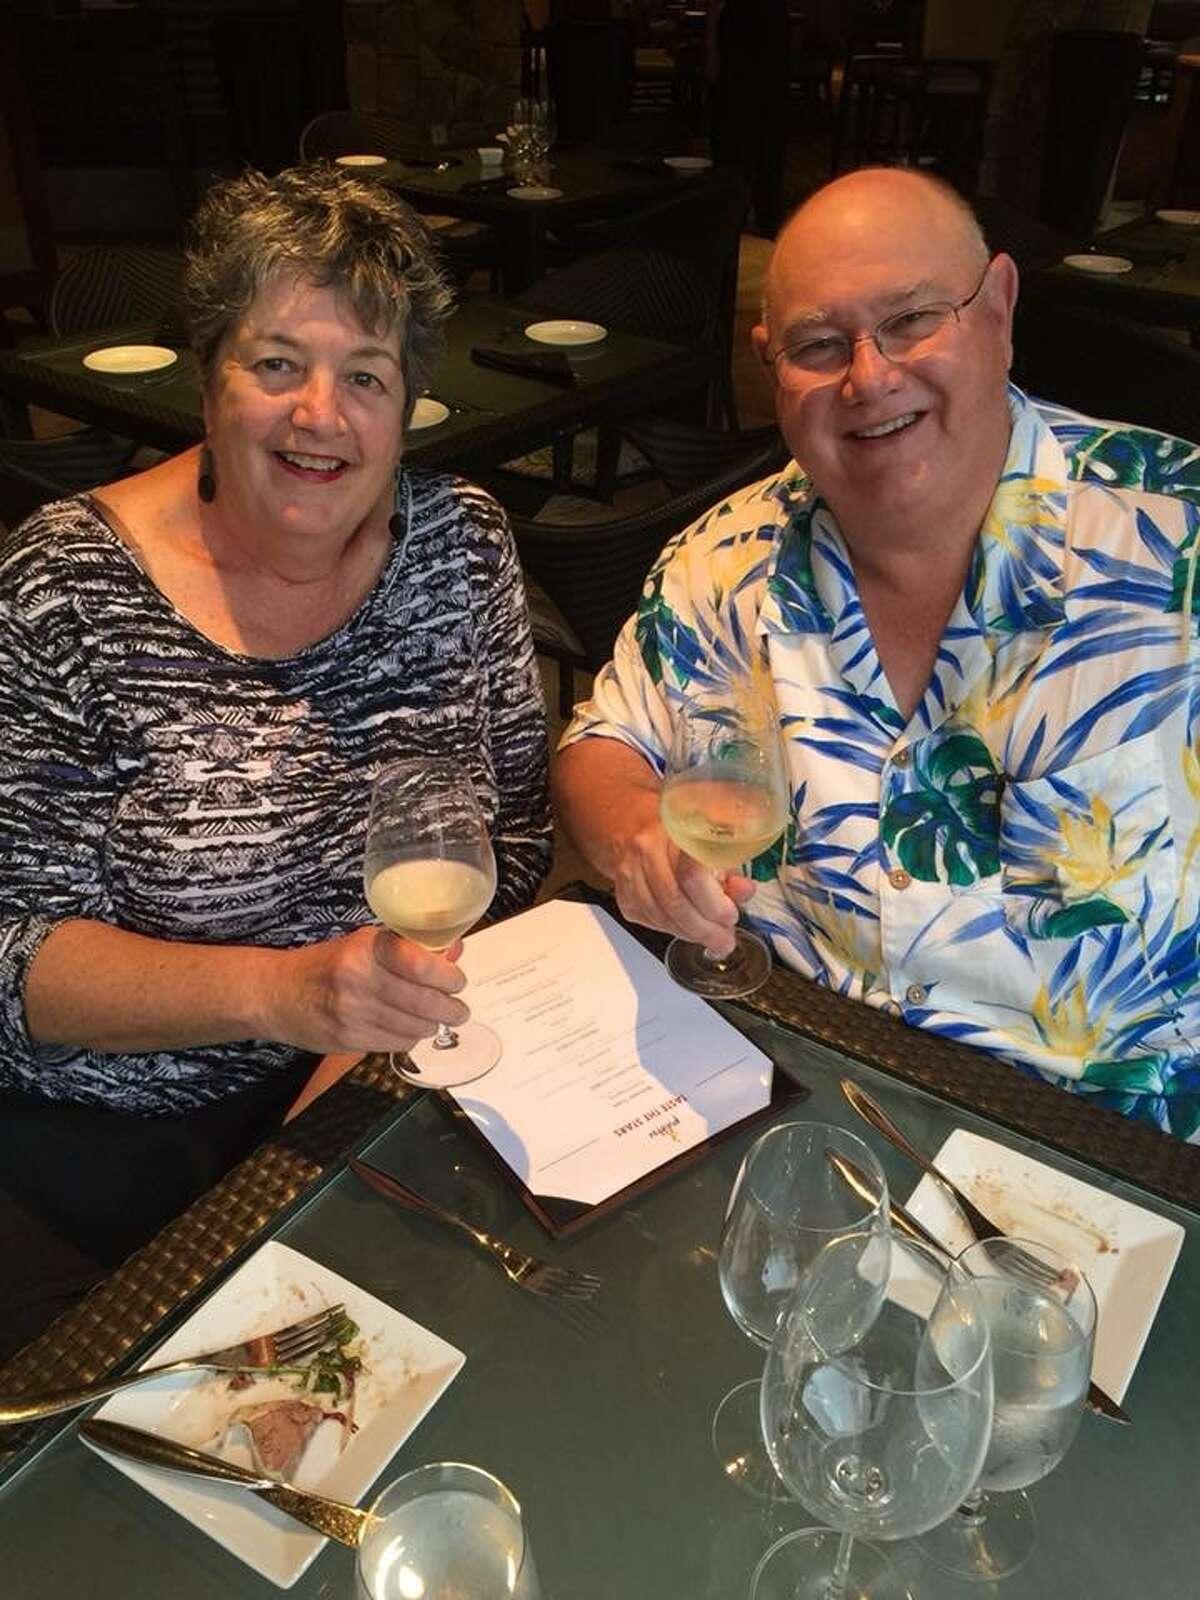 Before: Kevin and Linda Dellsperger have lost 150 pounds together.